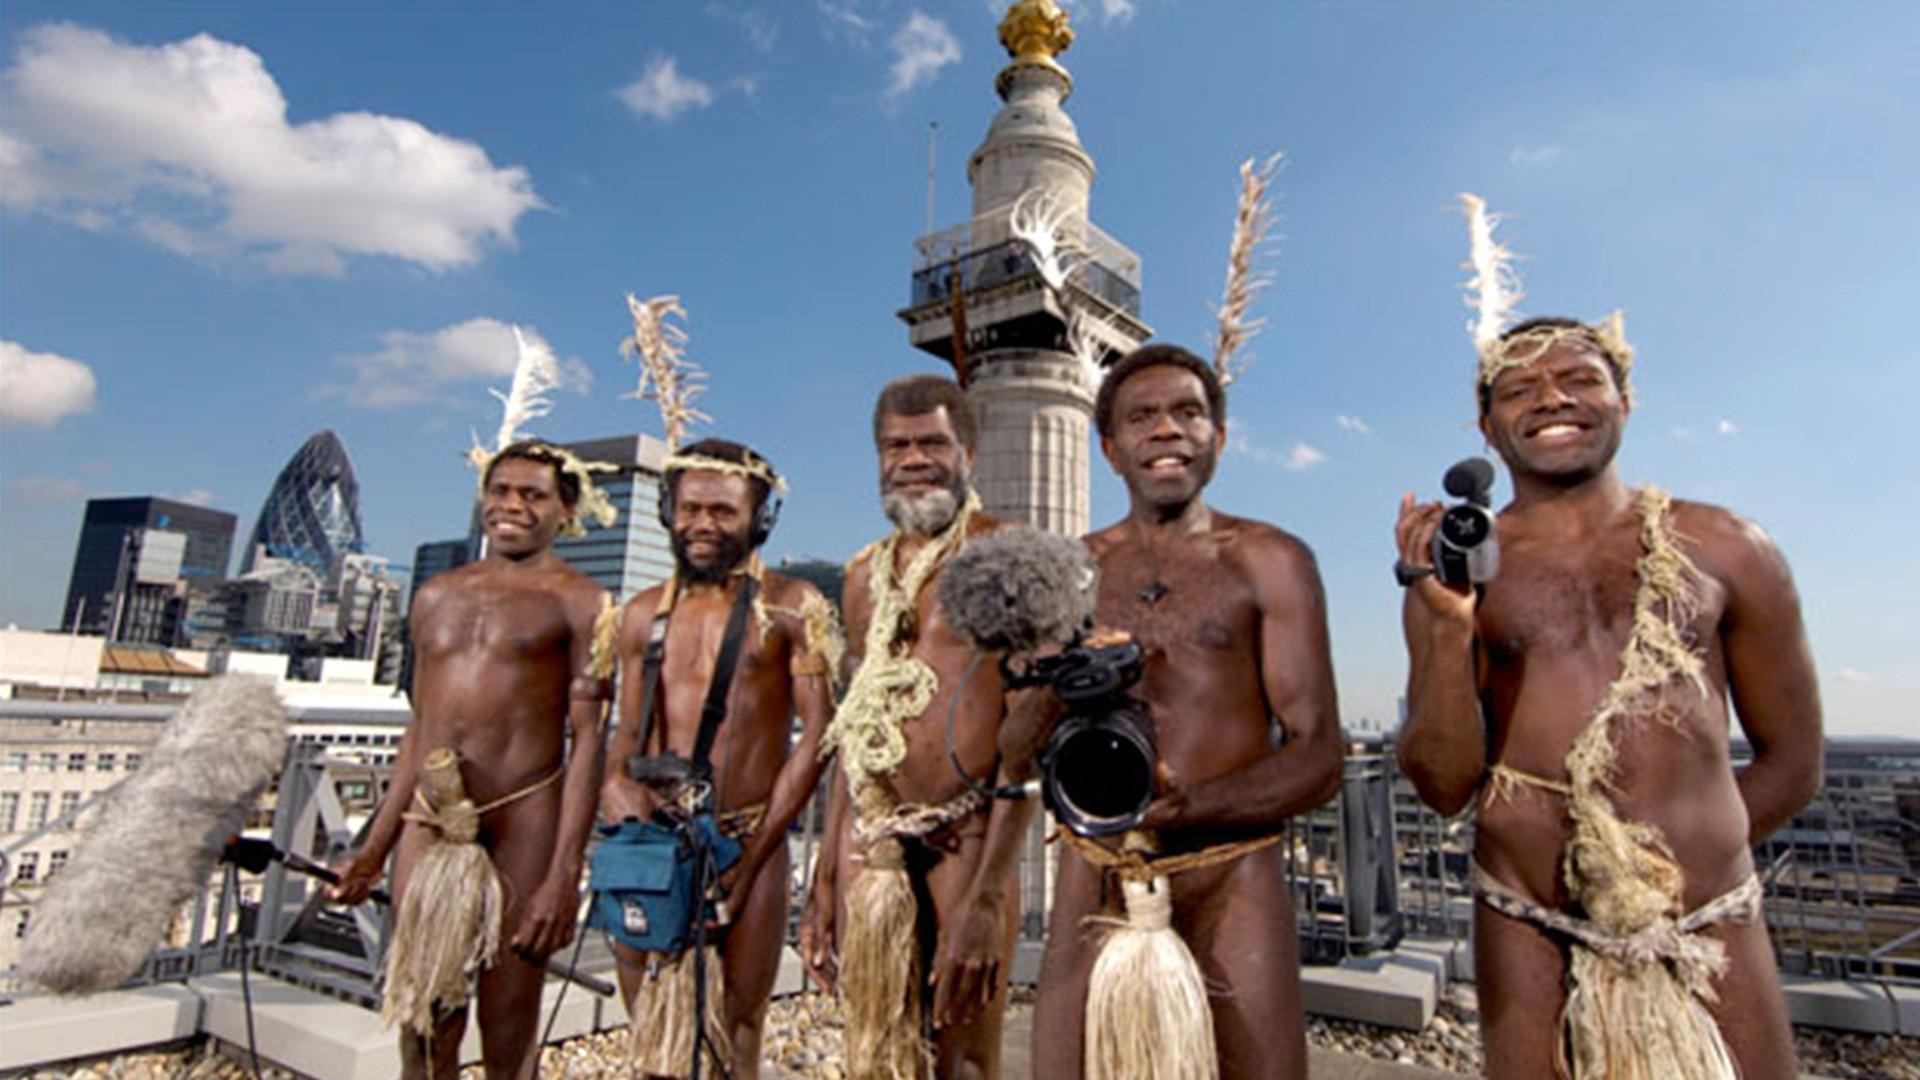 Meet the Natives - All 4